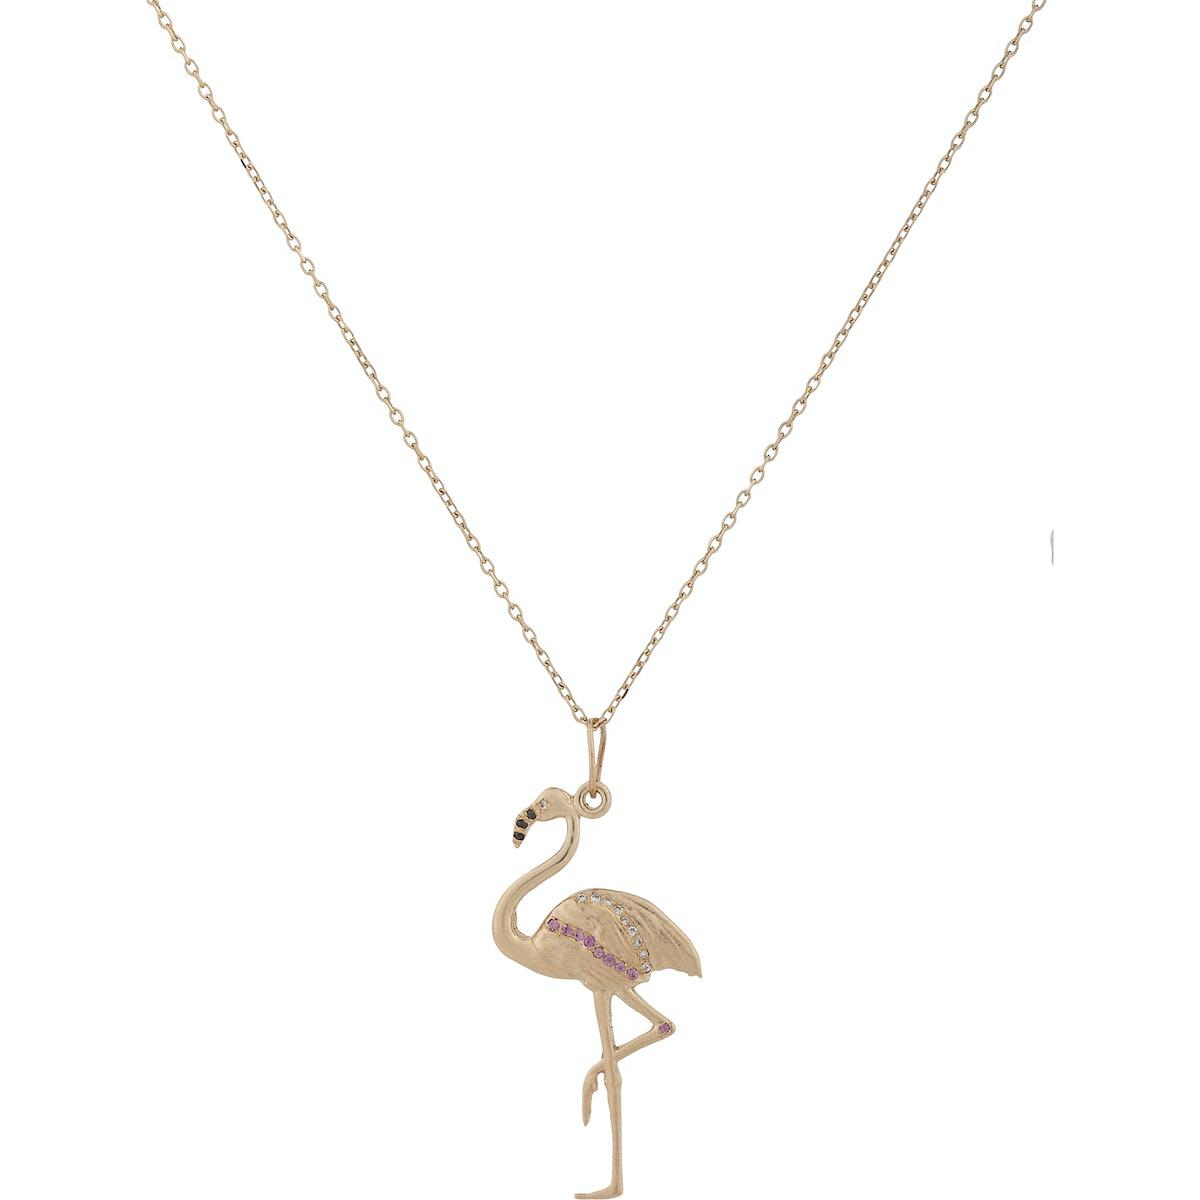 Bianca Pratt necklace